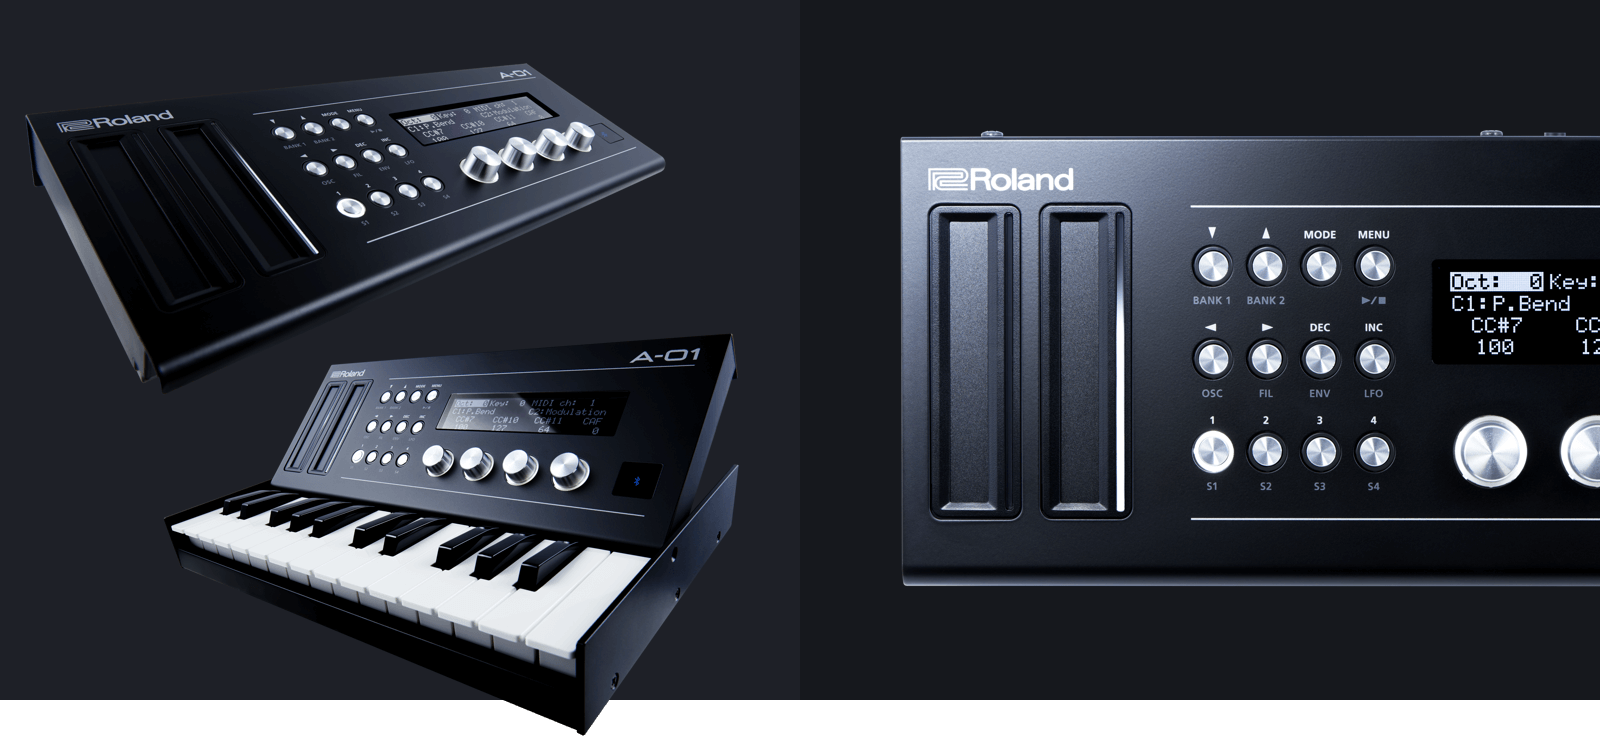 Roland A-01, controlador y motor de sonido de bolsillo (NAMM 2016) - Blog de Microfusa